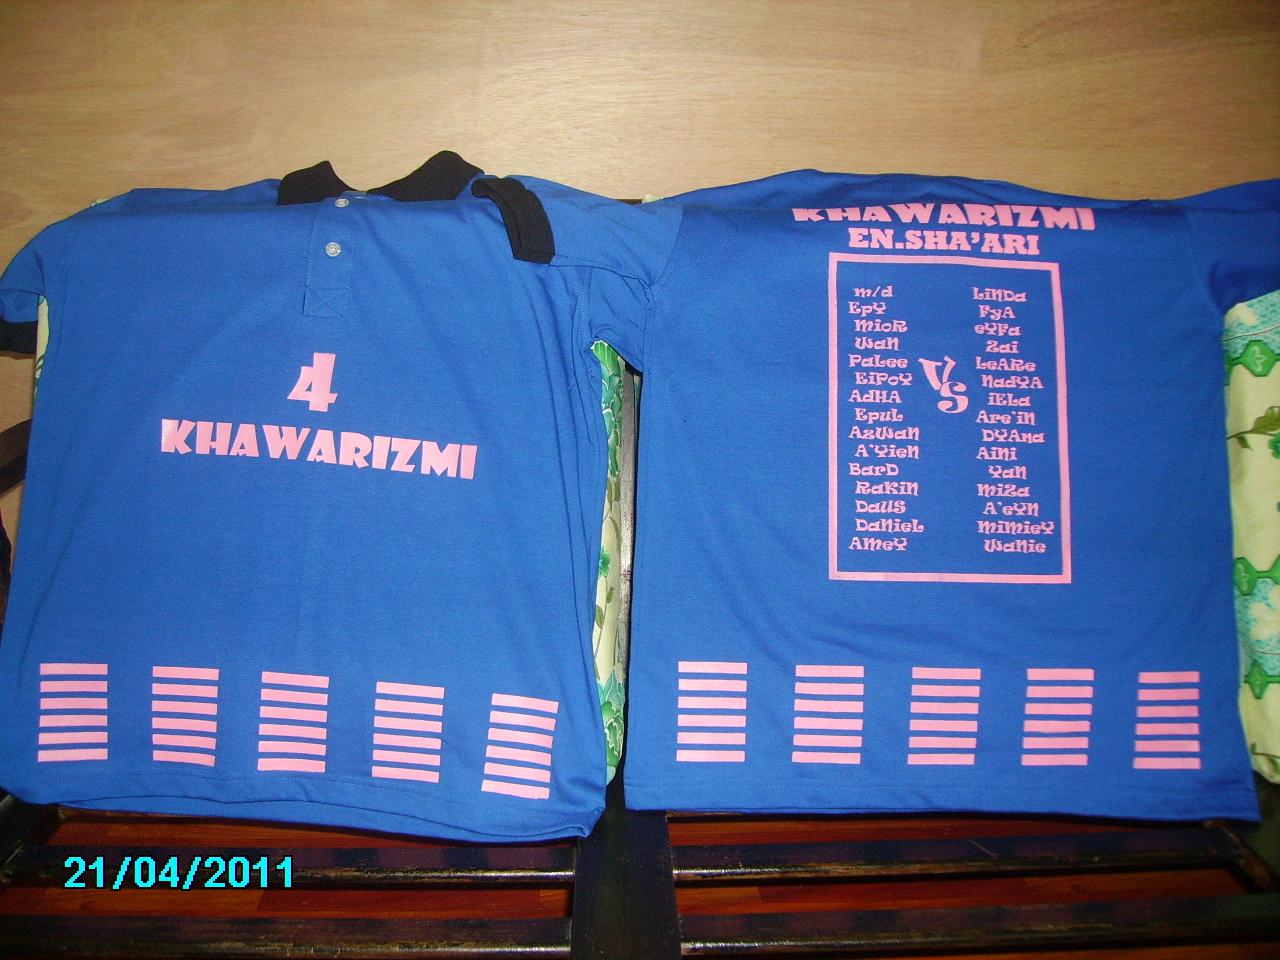 Design baju t shirt kelas - Ni Baju Kelas 4 Khawarizmi Sekolah Kat Chenderong Balai Perak Design Semua Diaorang Buat Mula2 Tu Diaorang Nak Penuh Line2 Kat Bawah Tu Alah Ala2 Jersi